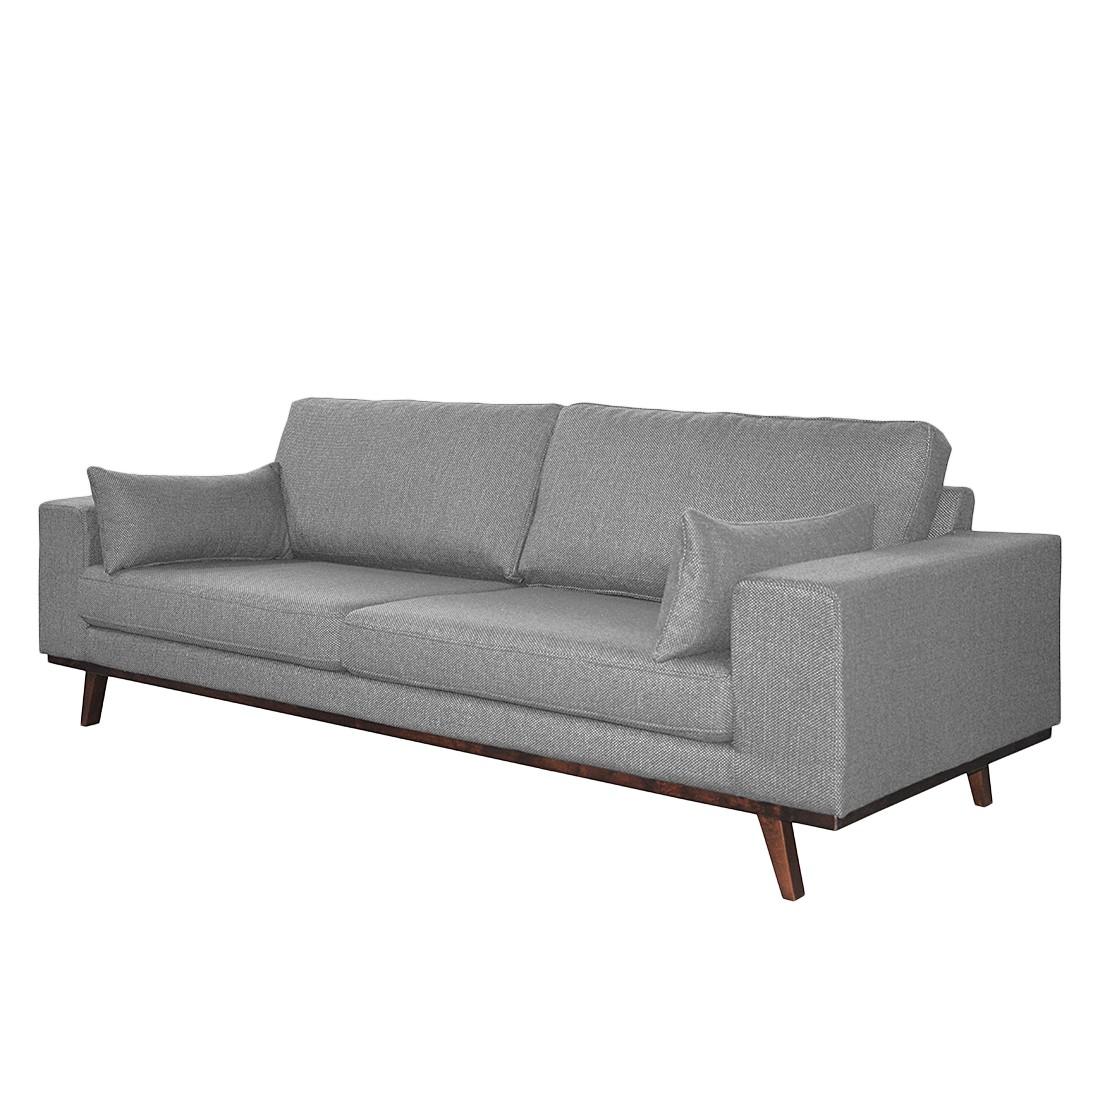 Designer Mobel Trends Morteens Sofa Billund 3 Sitzer